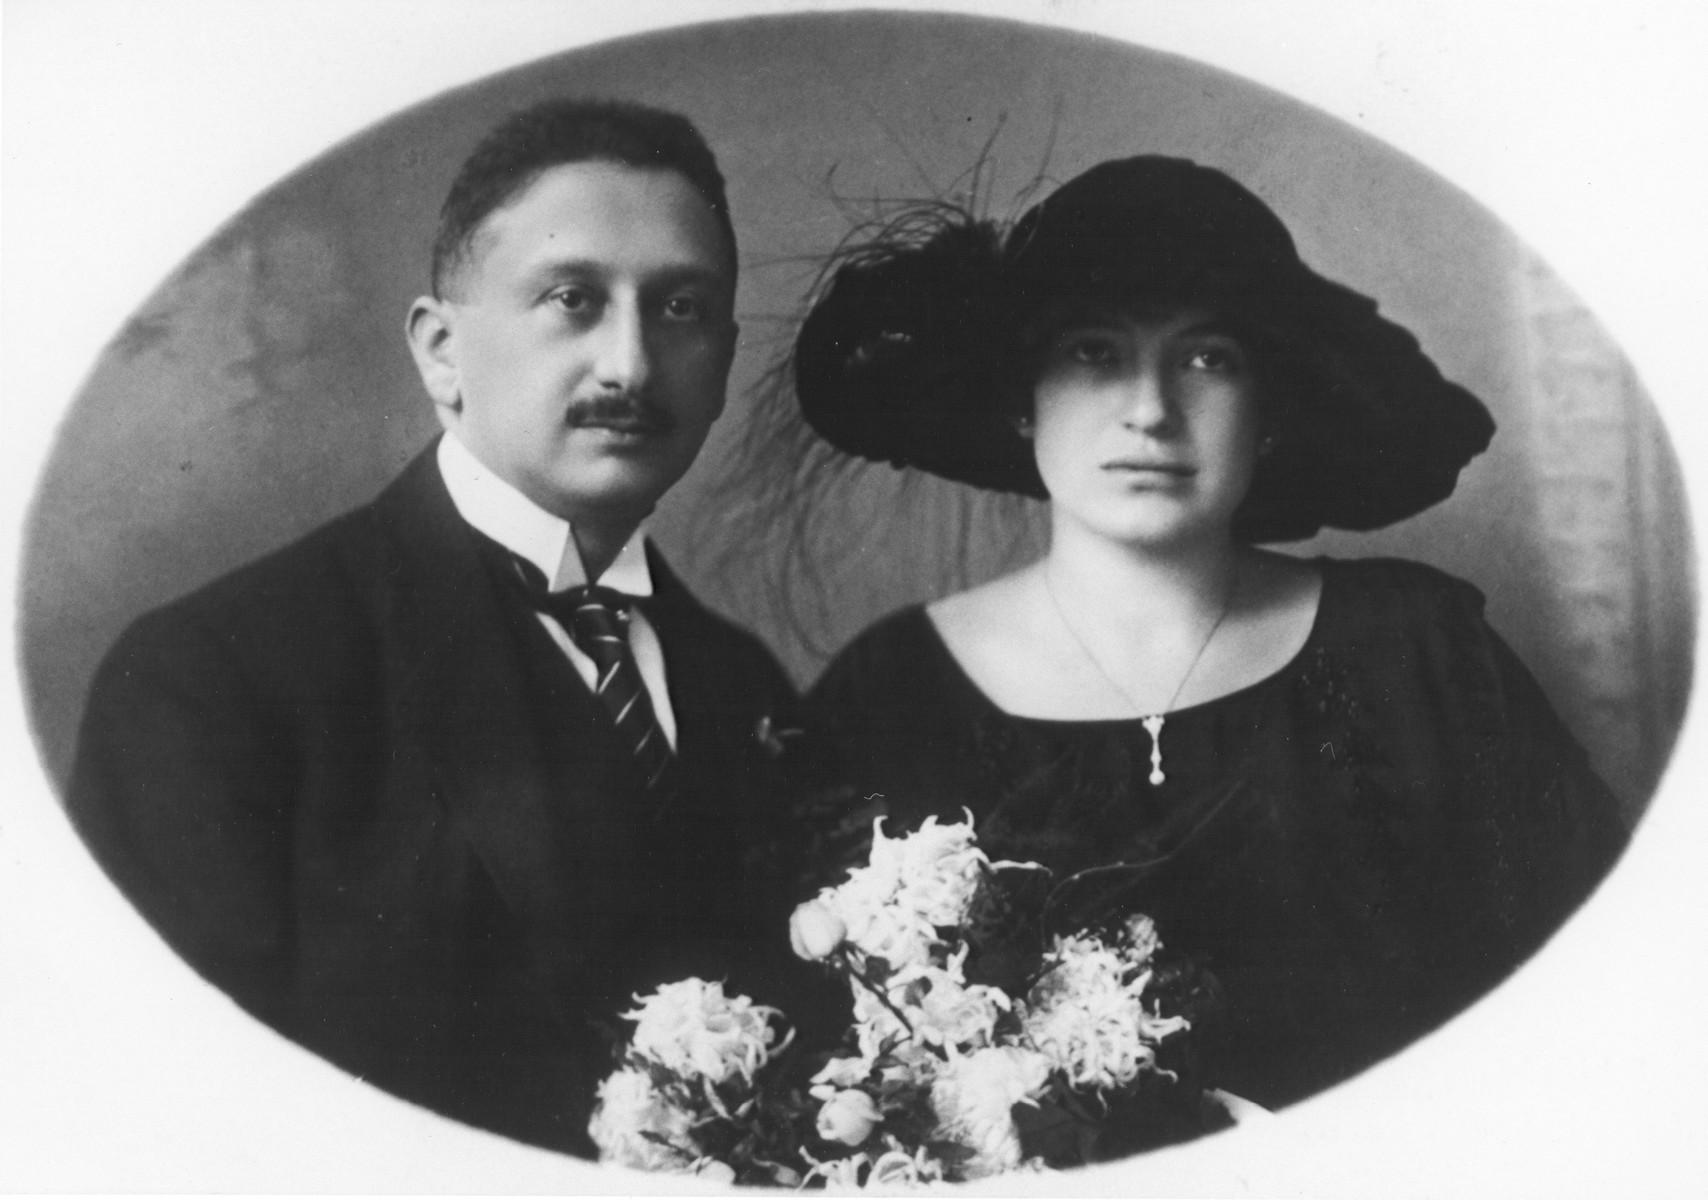 Wedding portrait of Viktor and Lili Schiller.